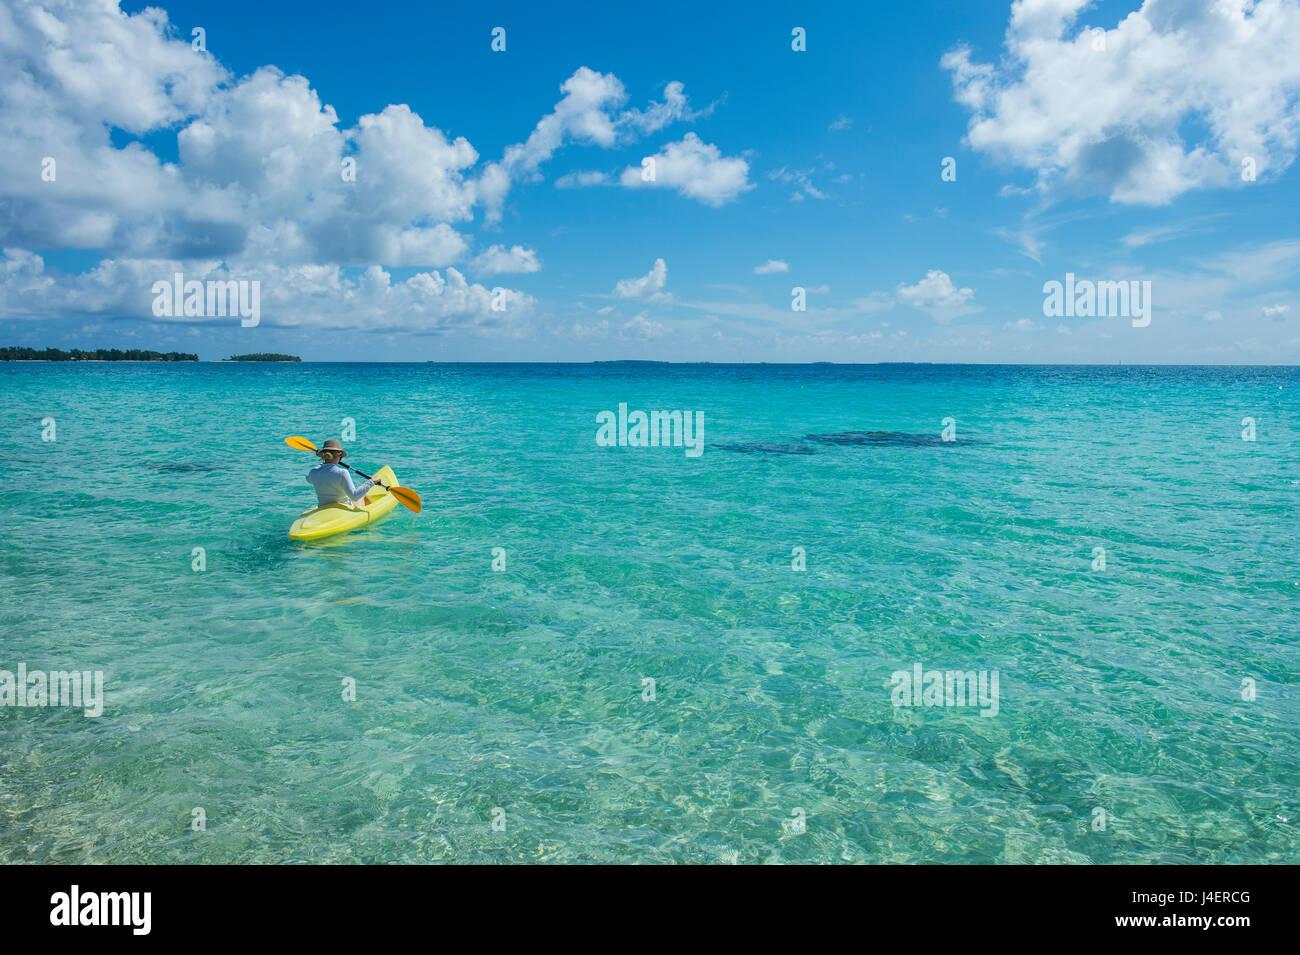 Donna kayak nelle acque turchesi di Tikehau, Tuamotus, Polinesia francese, Pacific Immagini Stock